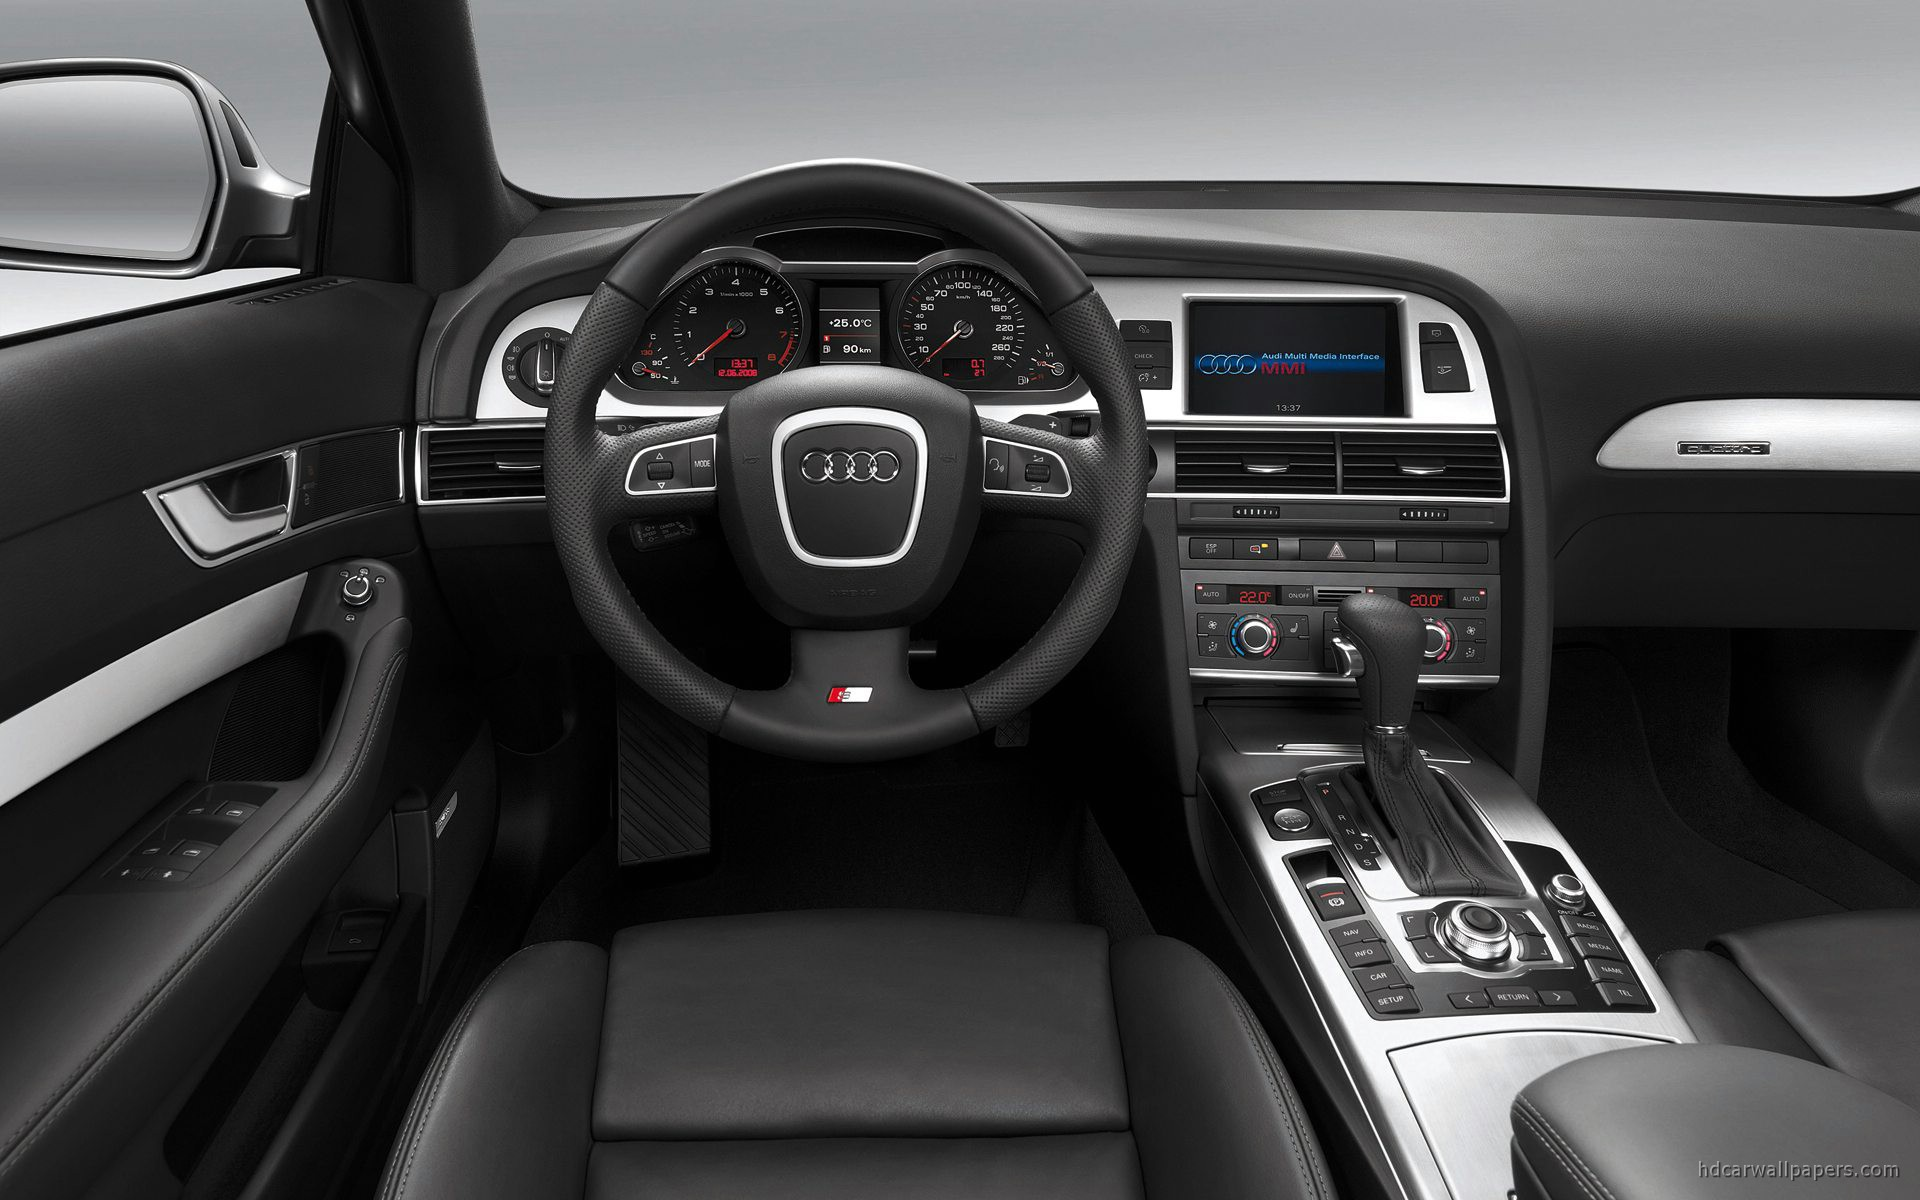 Audi A6 Sedan Interior Wallpaper | HD Car Wallpapers | ID #82